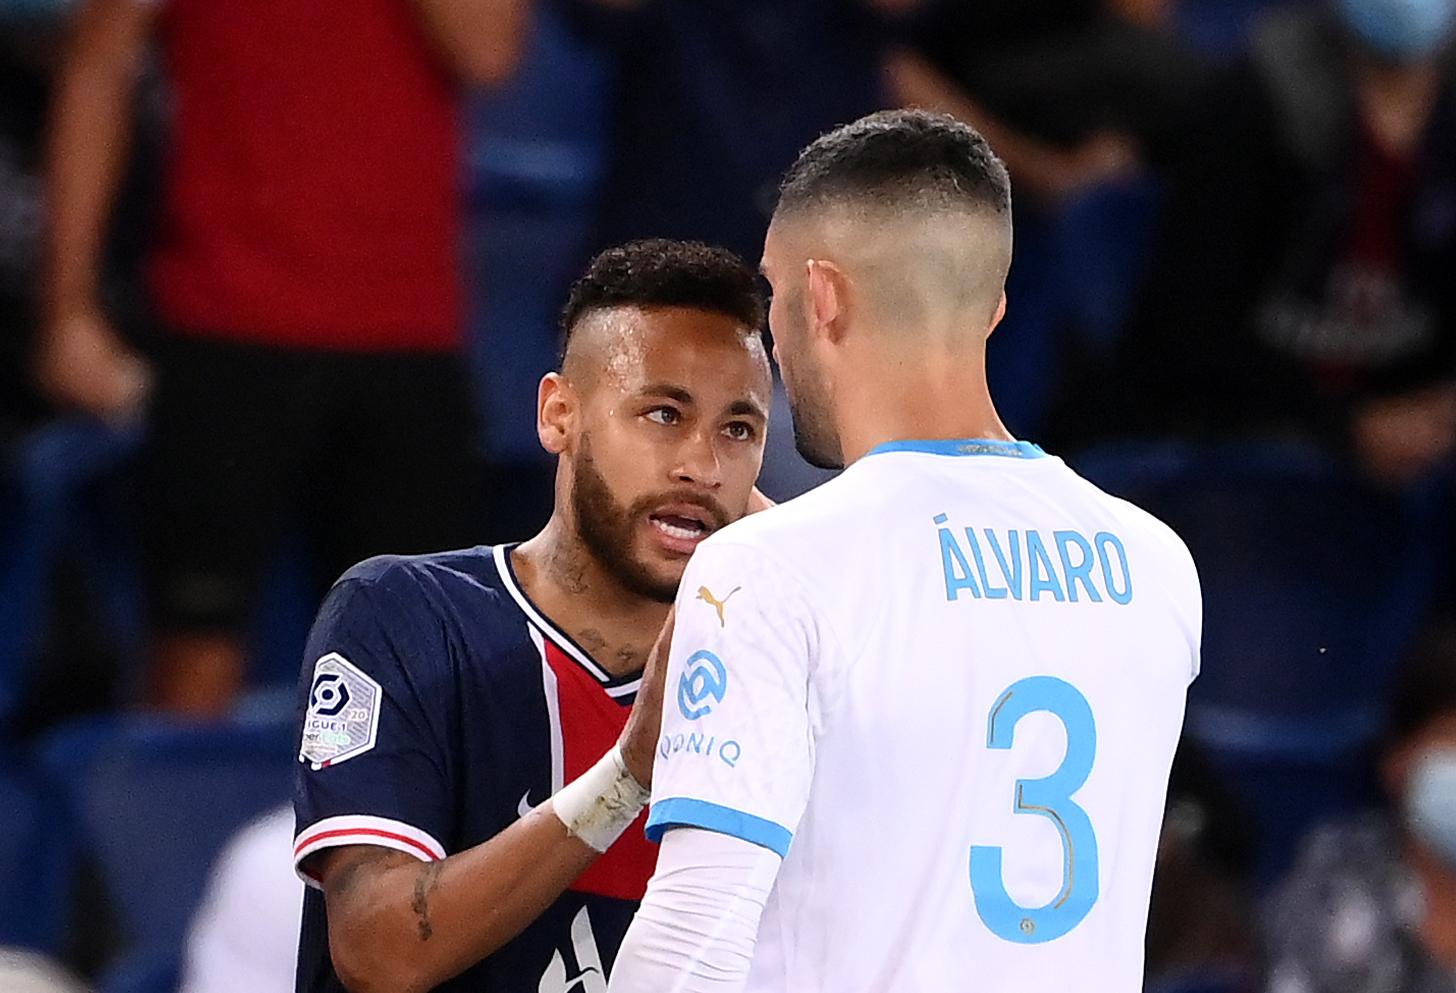 Video: Different Angle of the Confrontation Between Neymar and Álvaro  González - PSG Talk